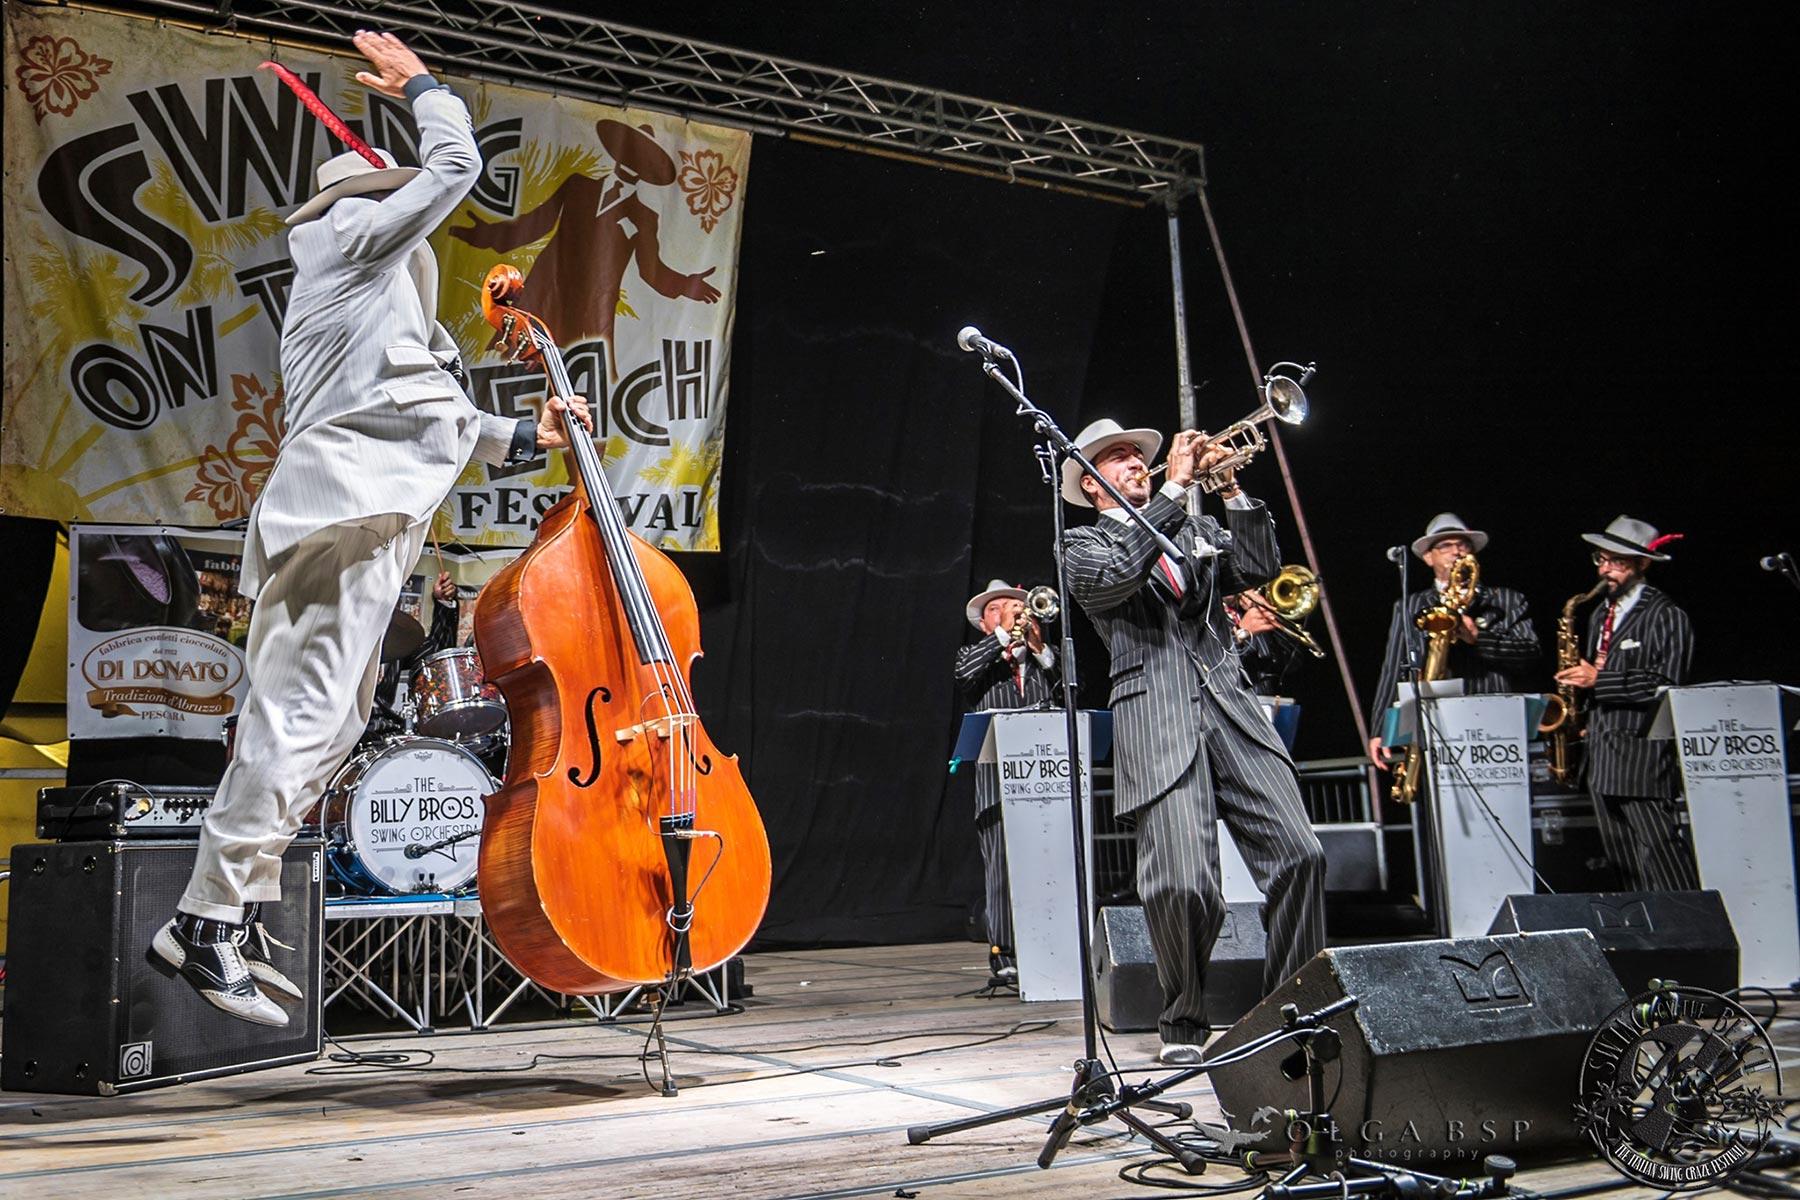 Pescara regina della Swing-mania